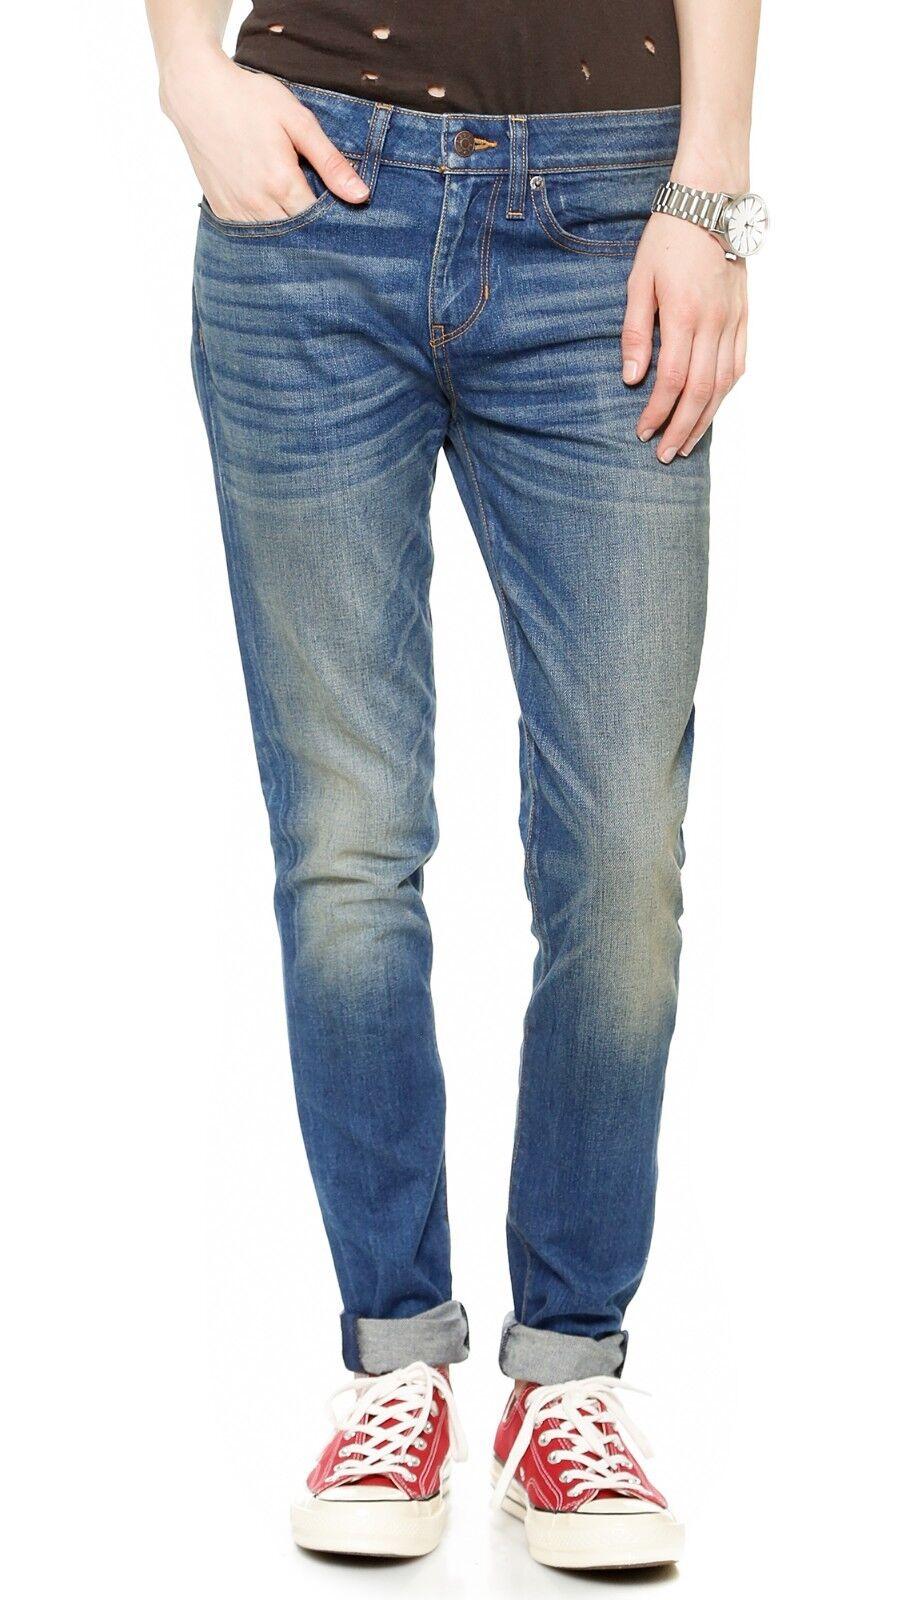 6397 Women's Loose Skinny Medium Dirty Jeans Size 30 Retail